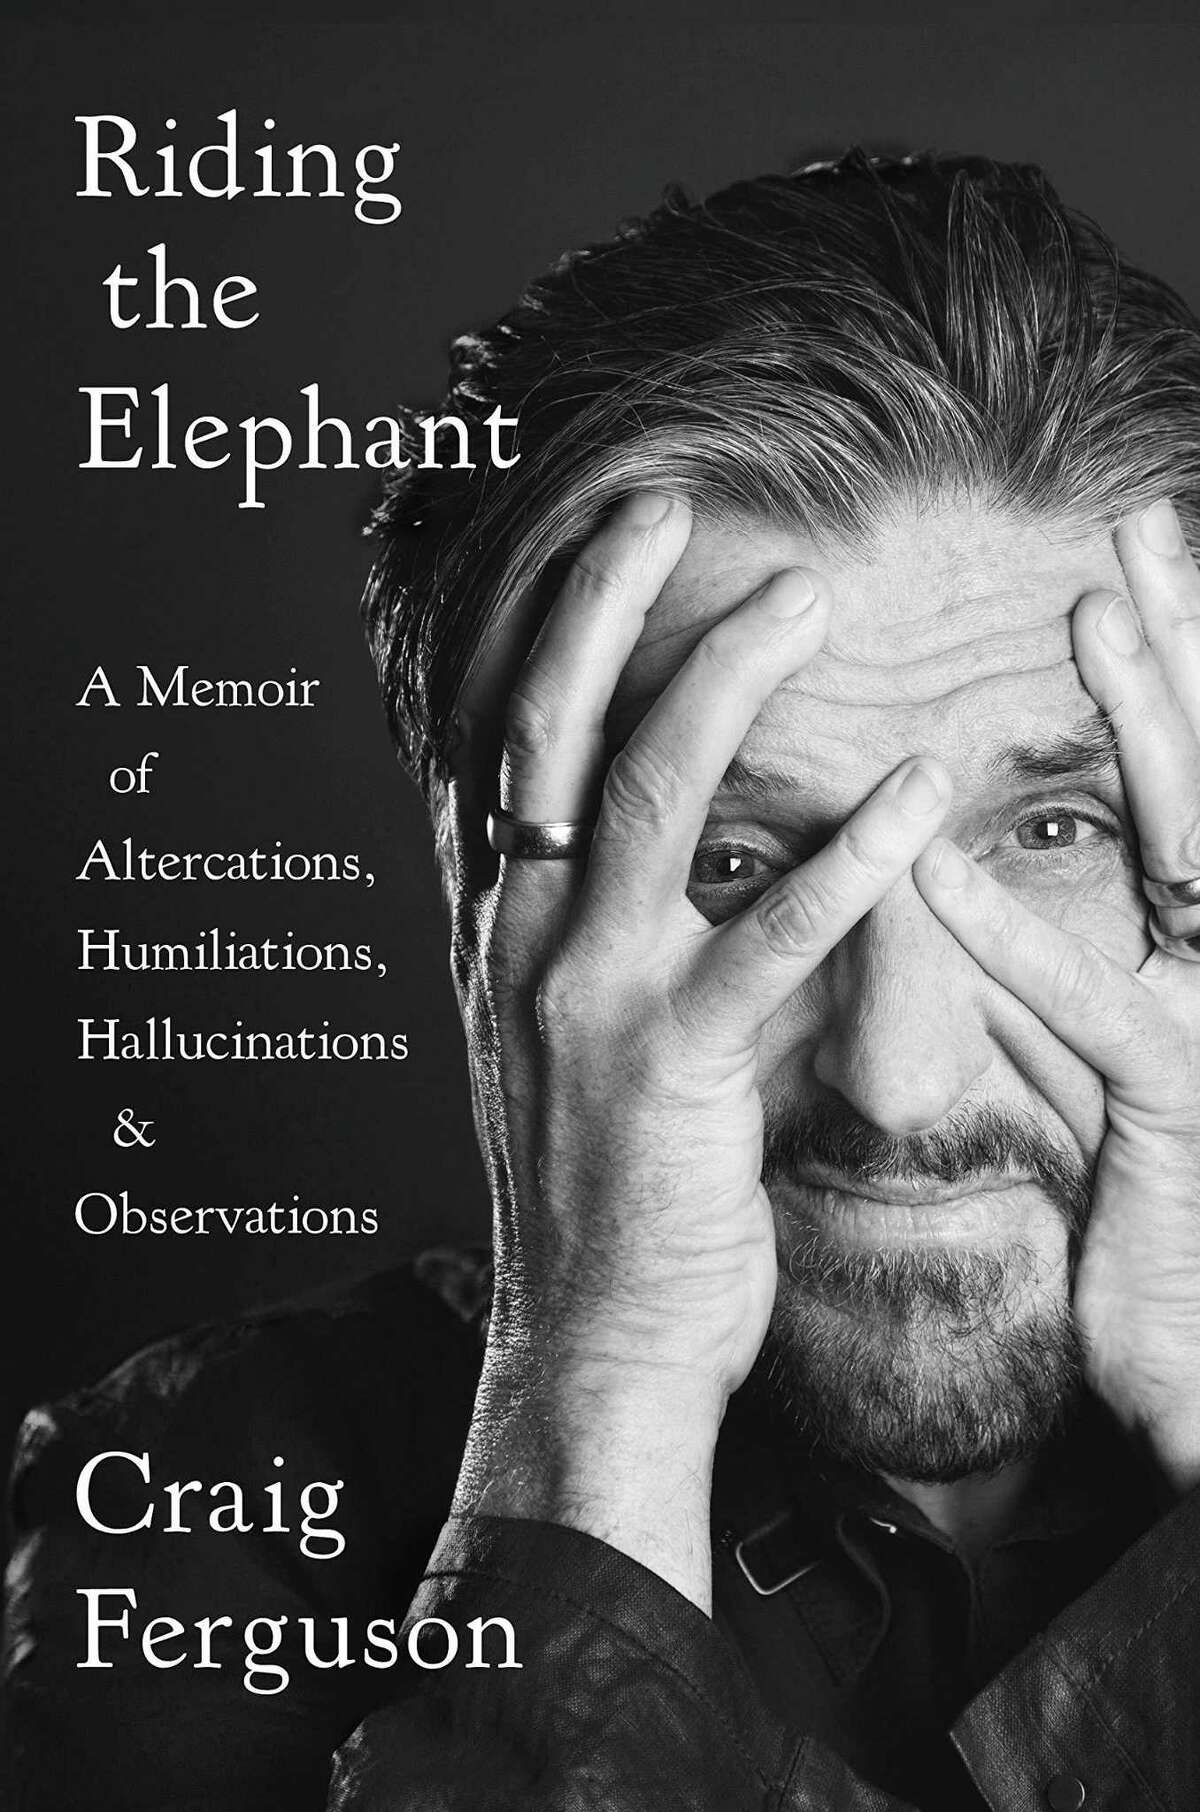 Craig Ferguson will discuss his new memoir,